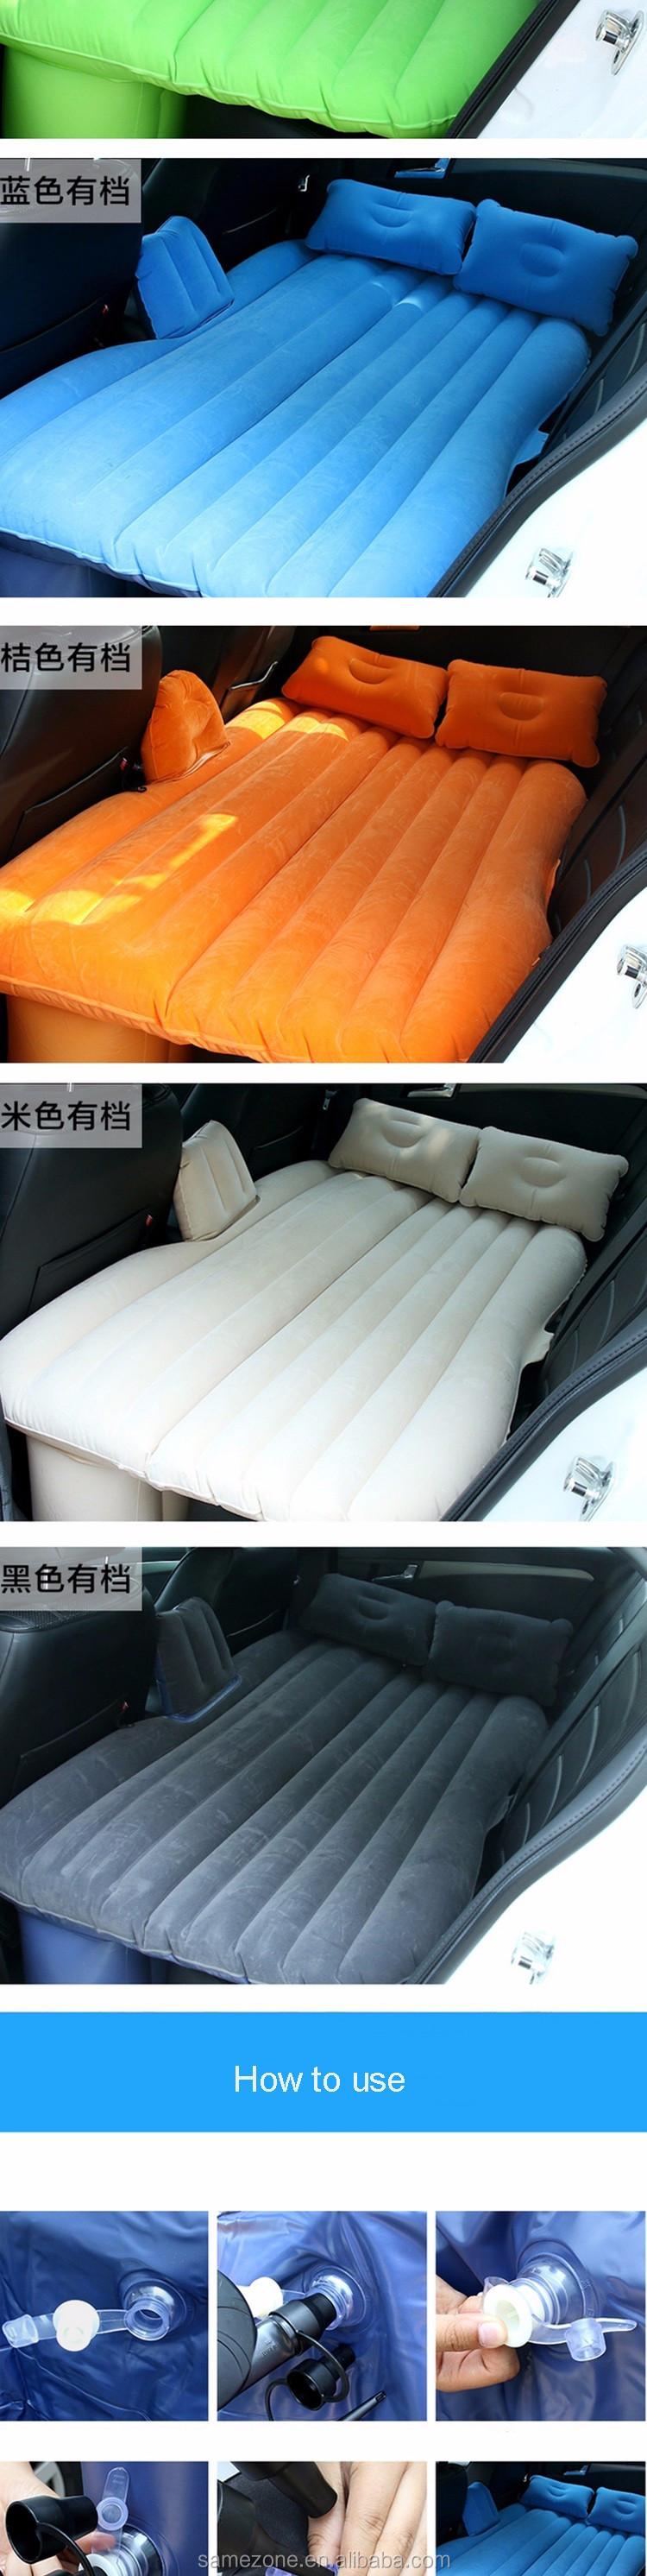 voiture portable camping lit pliant lit ultra l ger gonflable matelas d 39 air matelas tapis de. Black Bedroom Furniture Sets. Home Design Ideas